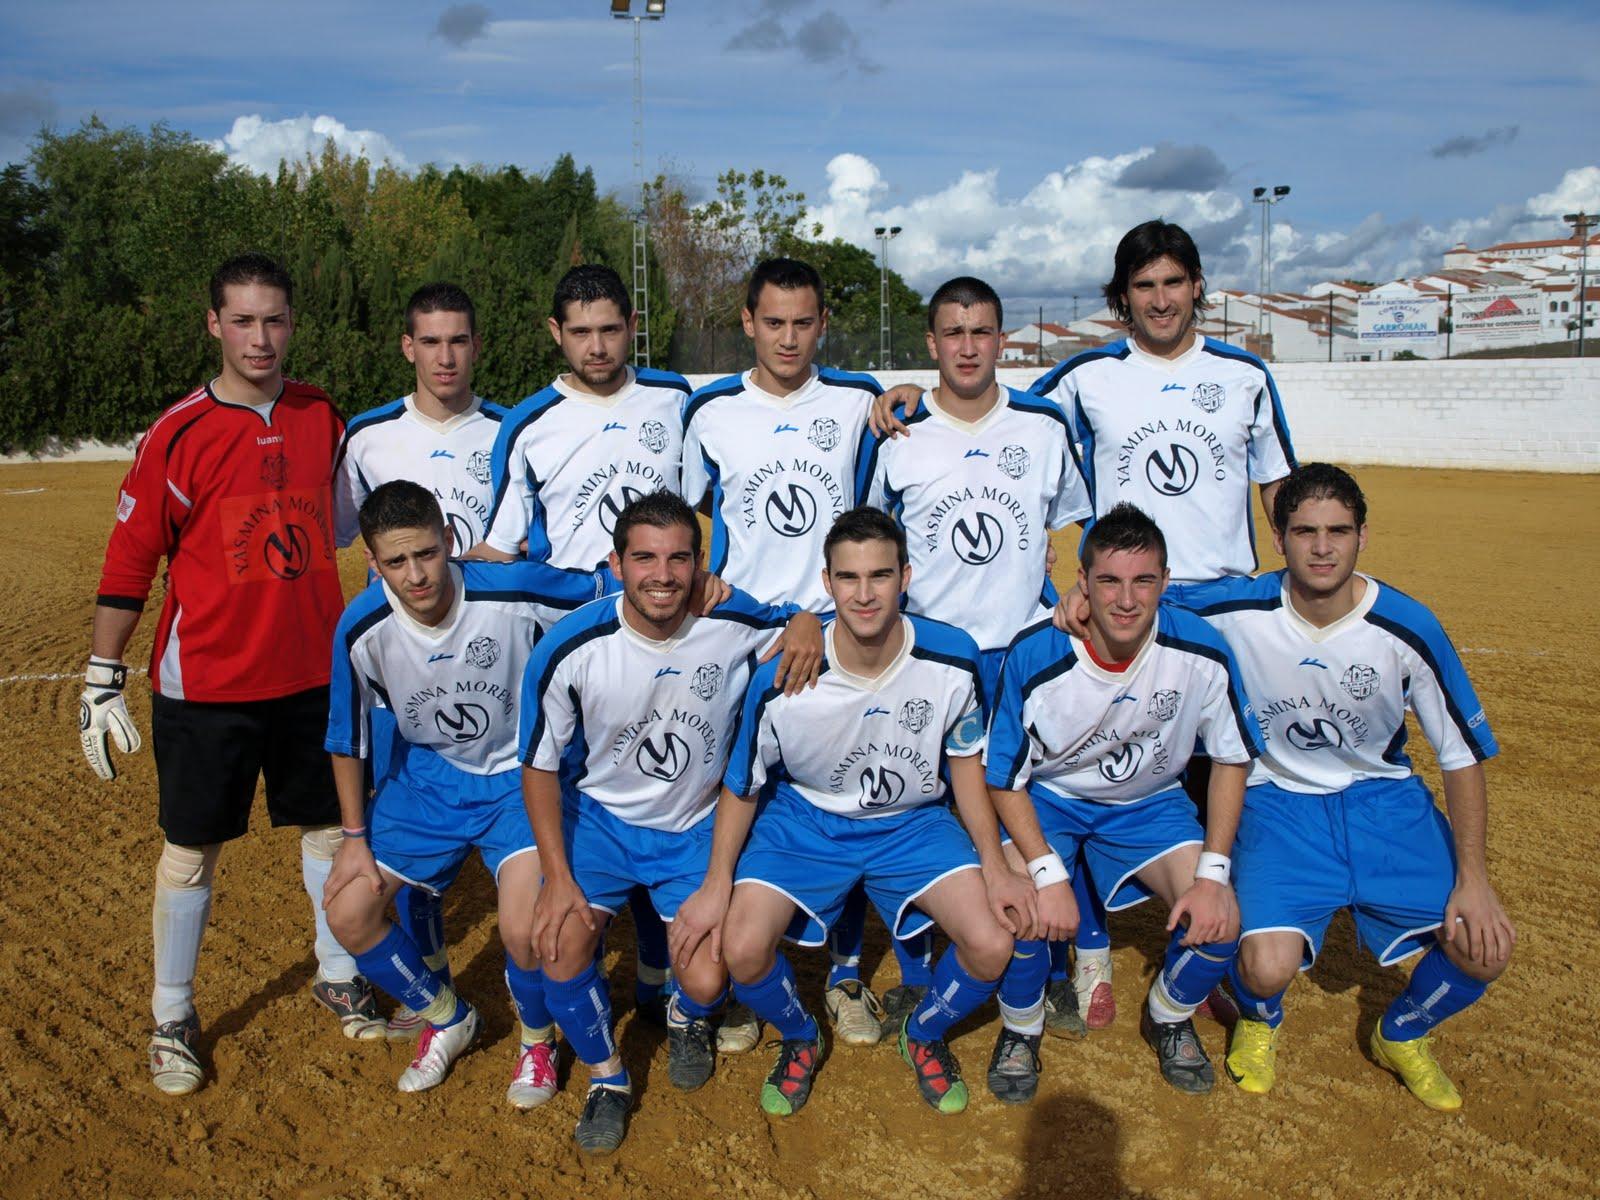 Futbolguadiato mellariense villanueva del duque jornada 2 for Villanueva del duque